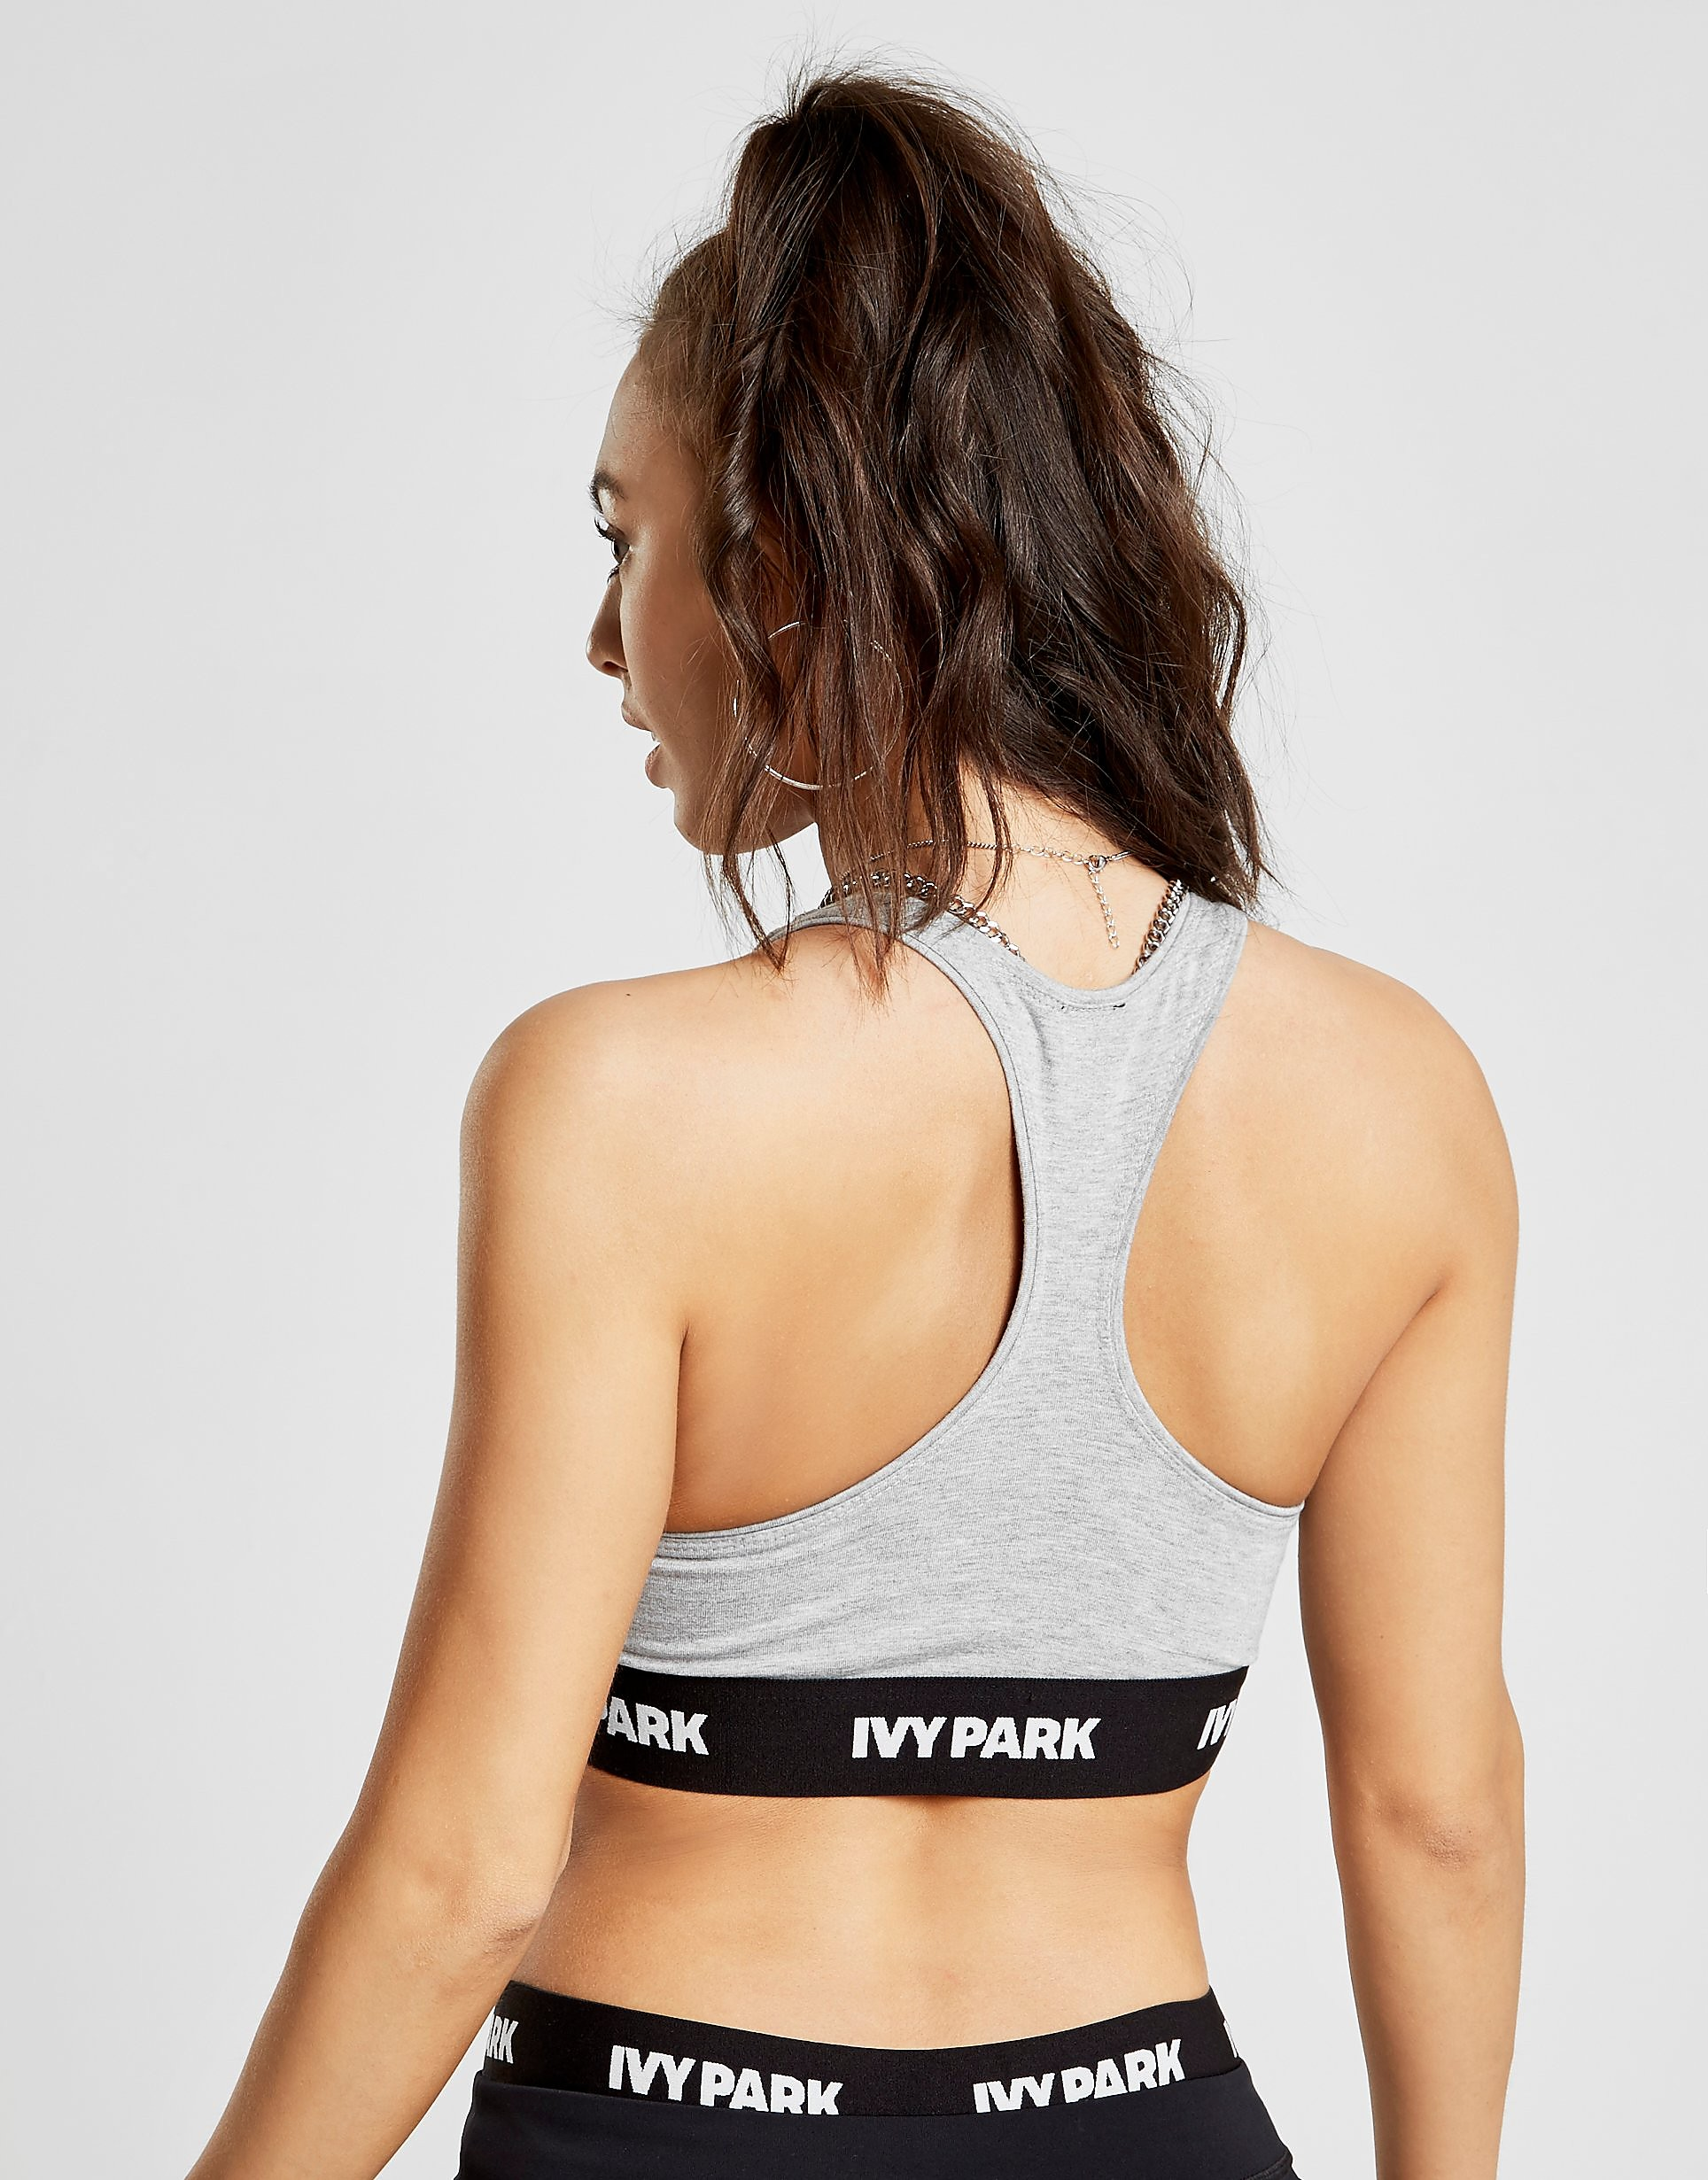 IVY PARK Tape Logo Bra